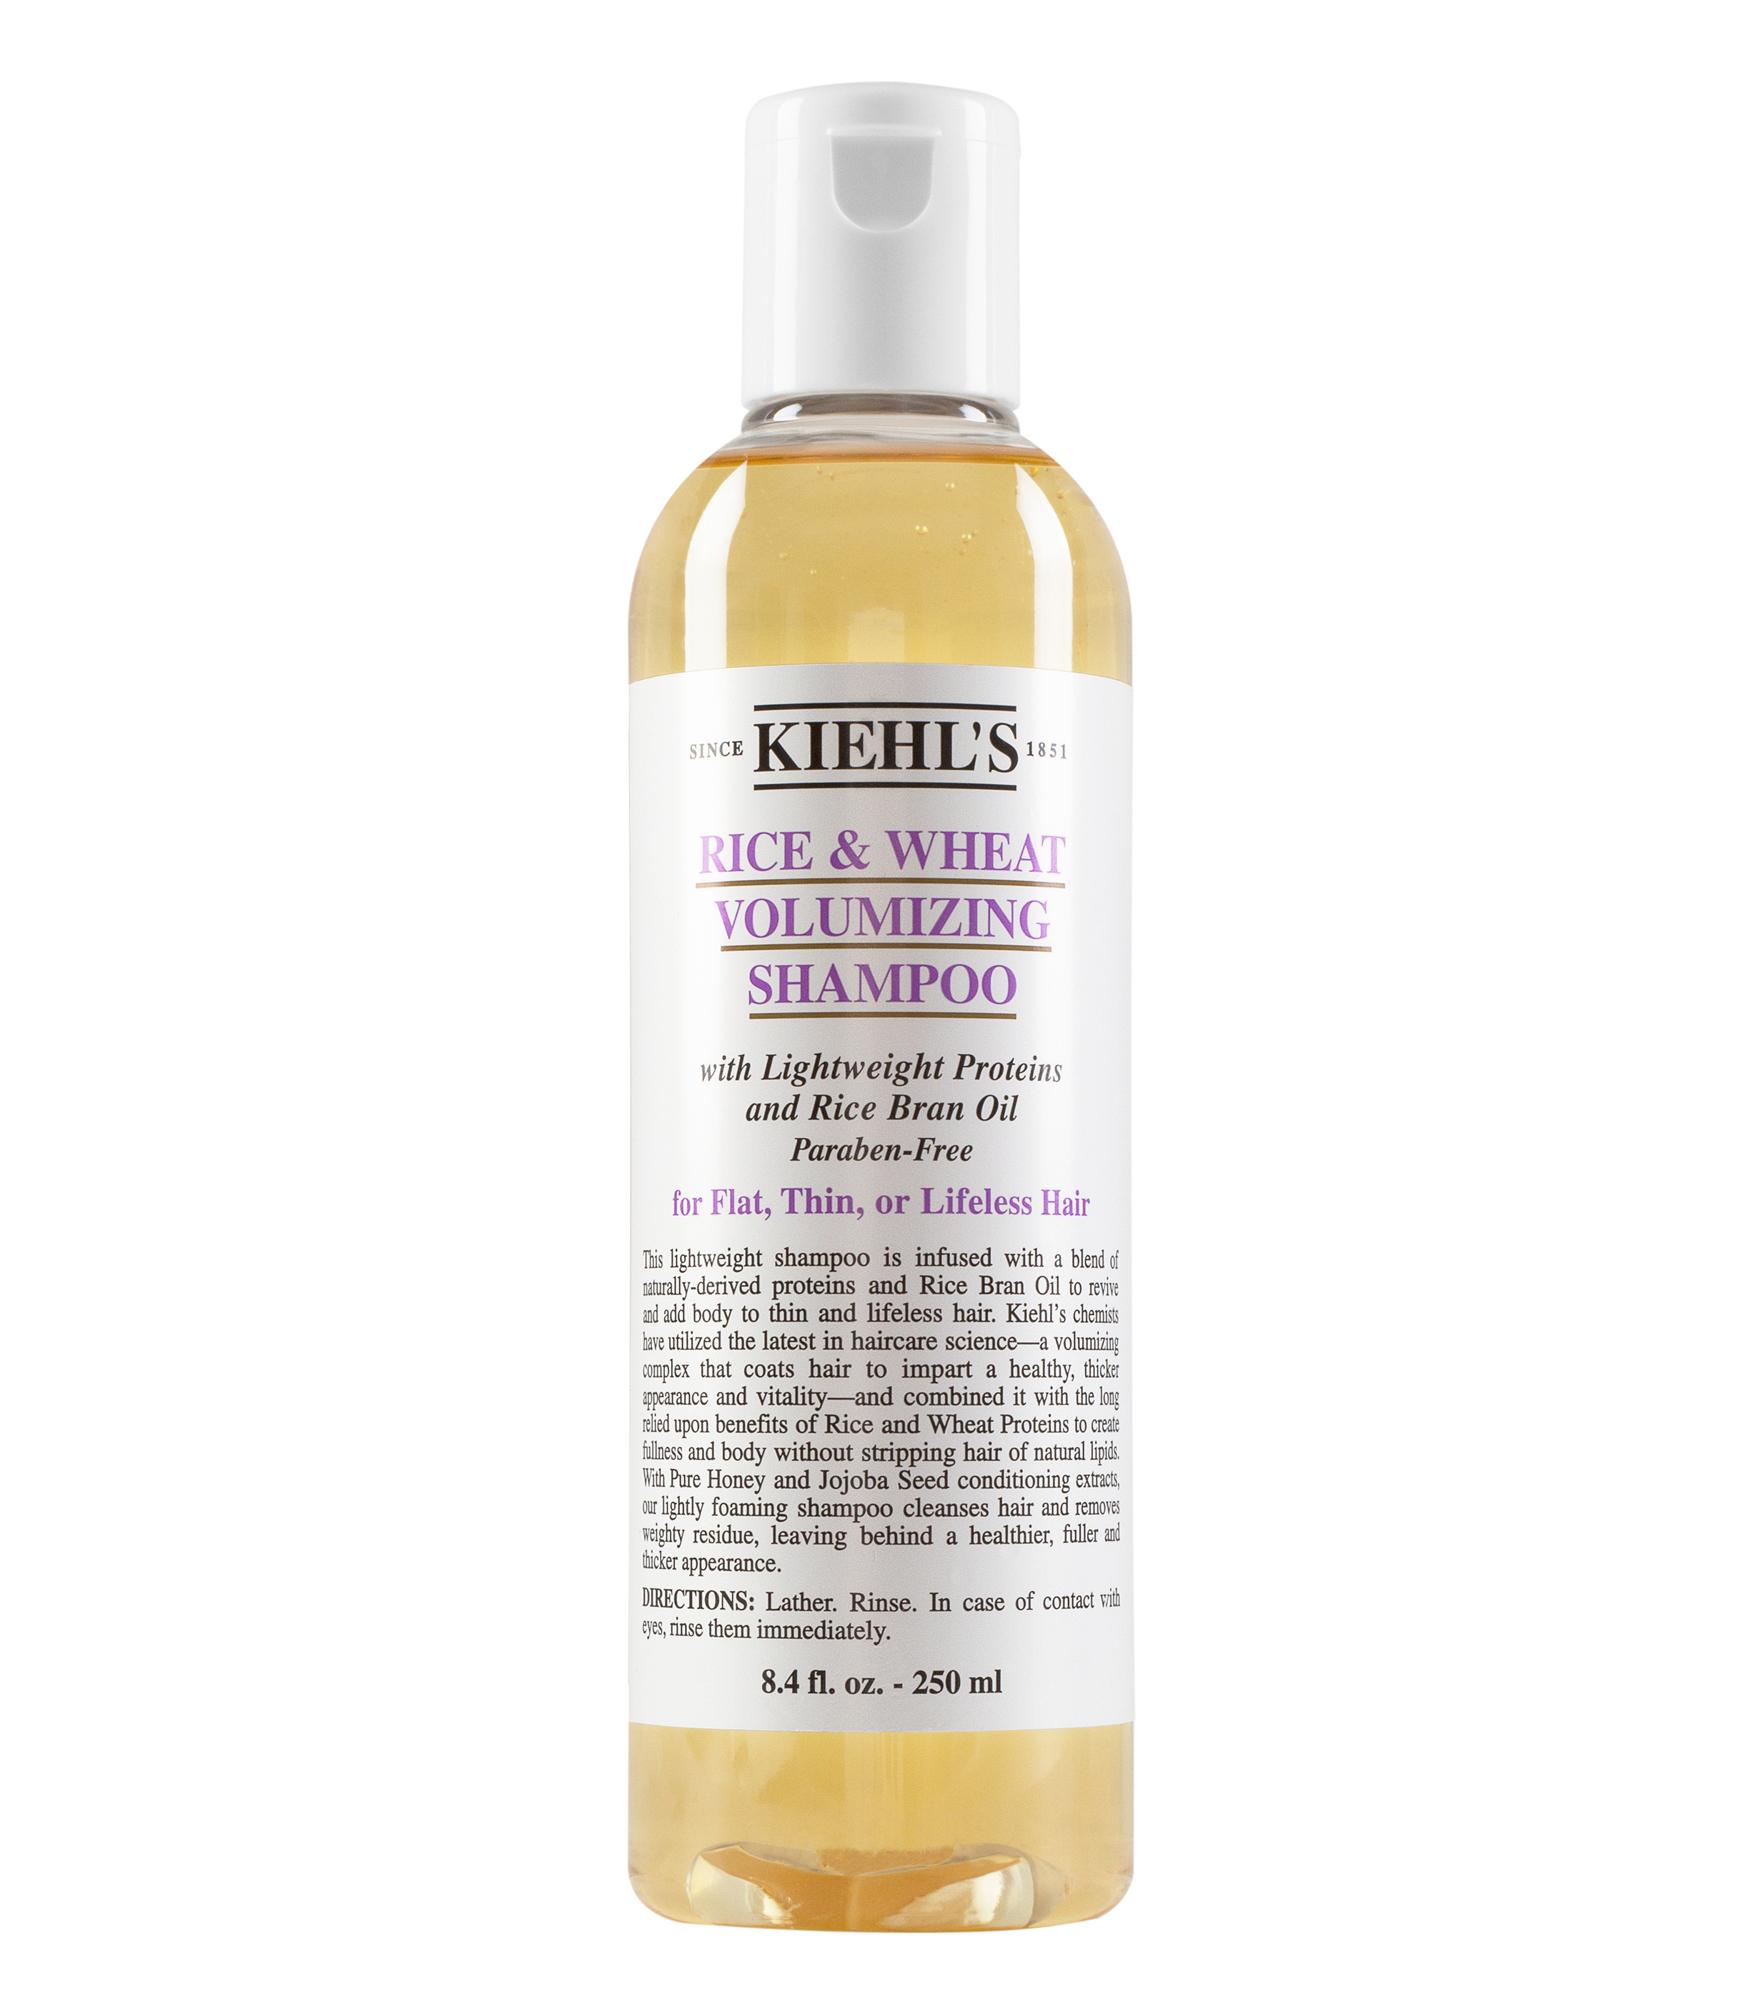 Kiehl's Rice and Wheat Volumizing Shampoo